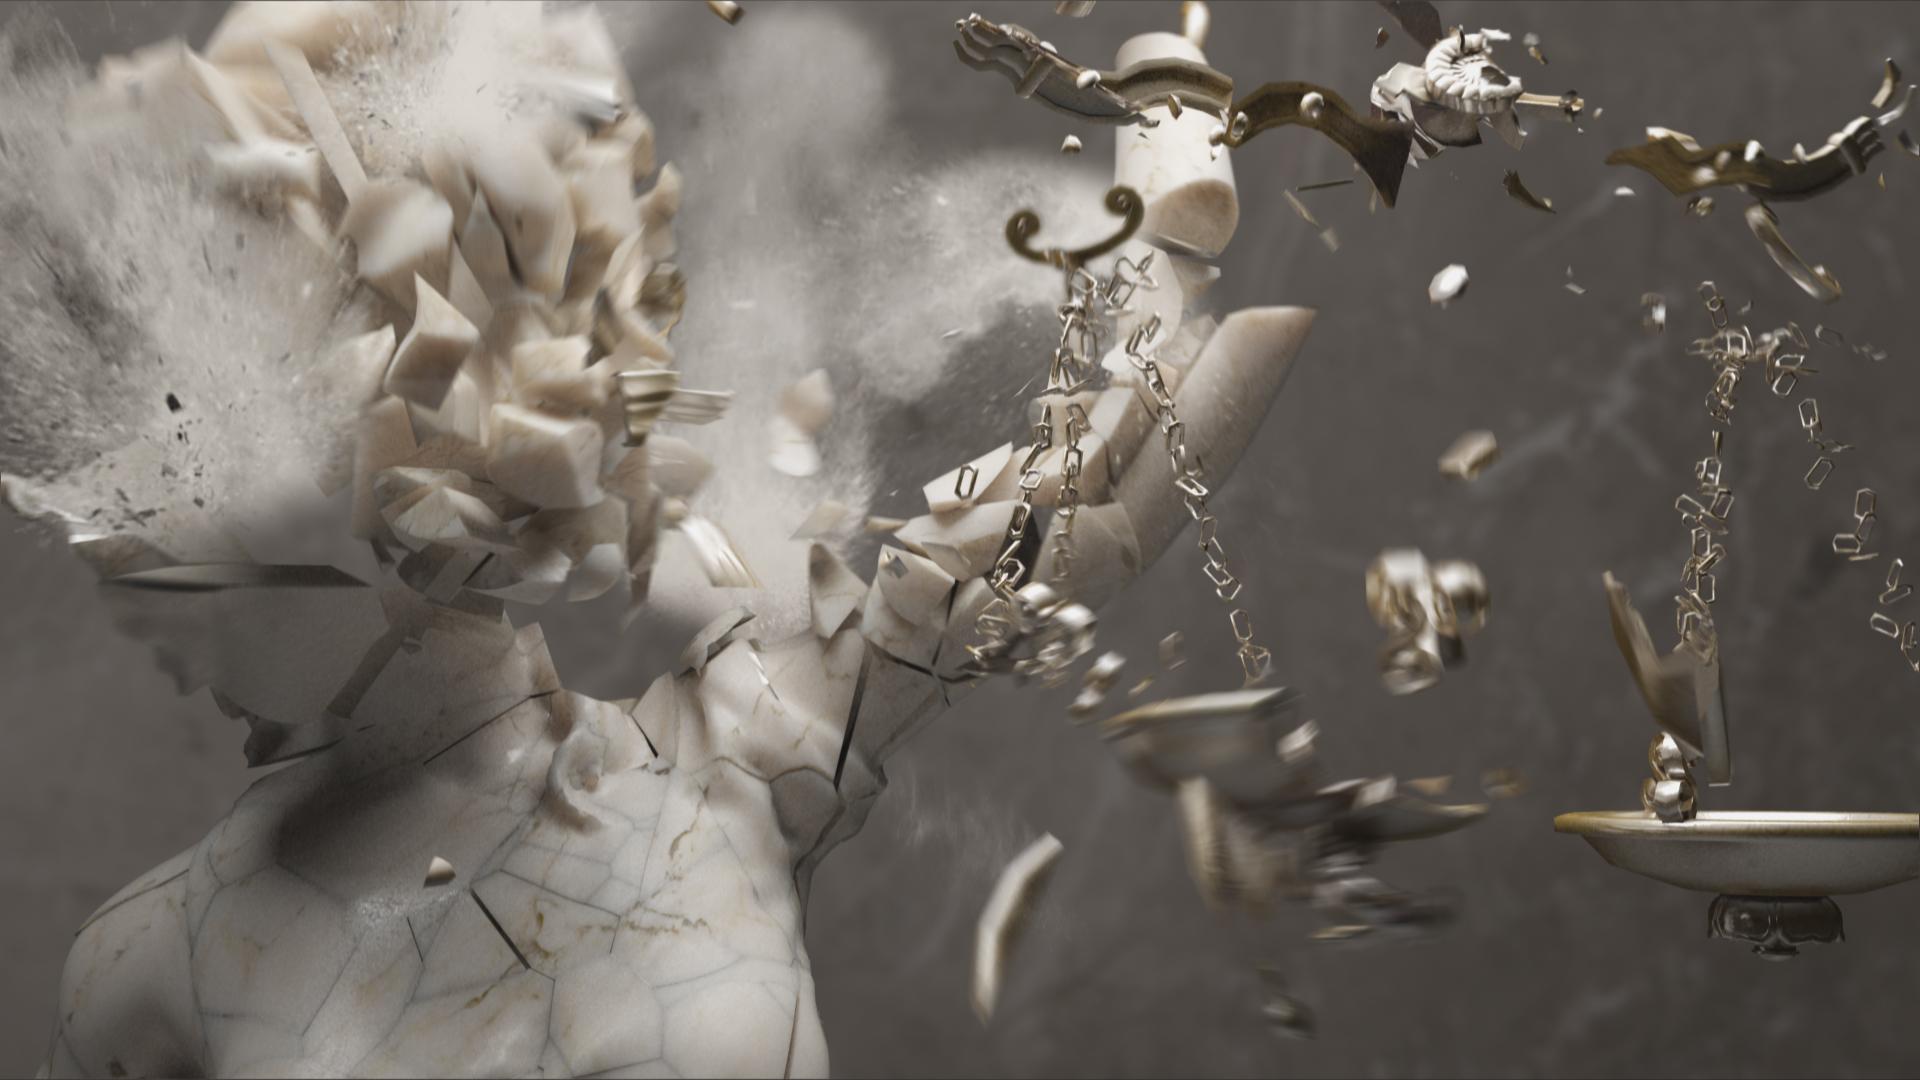 serie-traicion-tve-animacion-3d-explosion-escultura-4-1920x1080-1.jpg